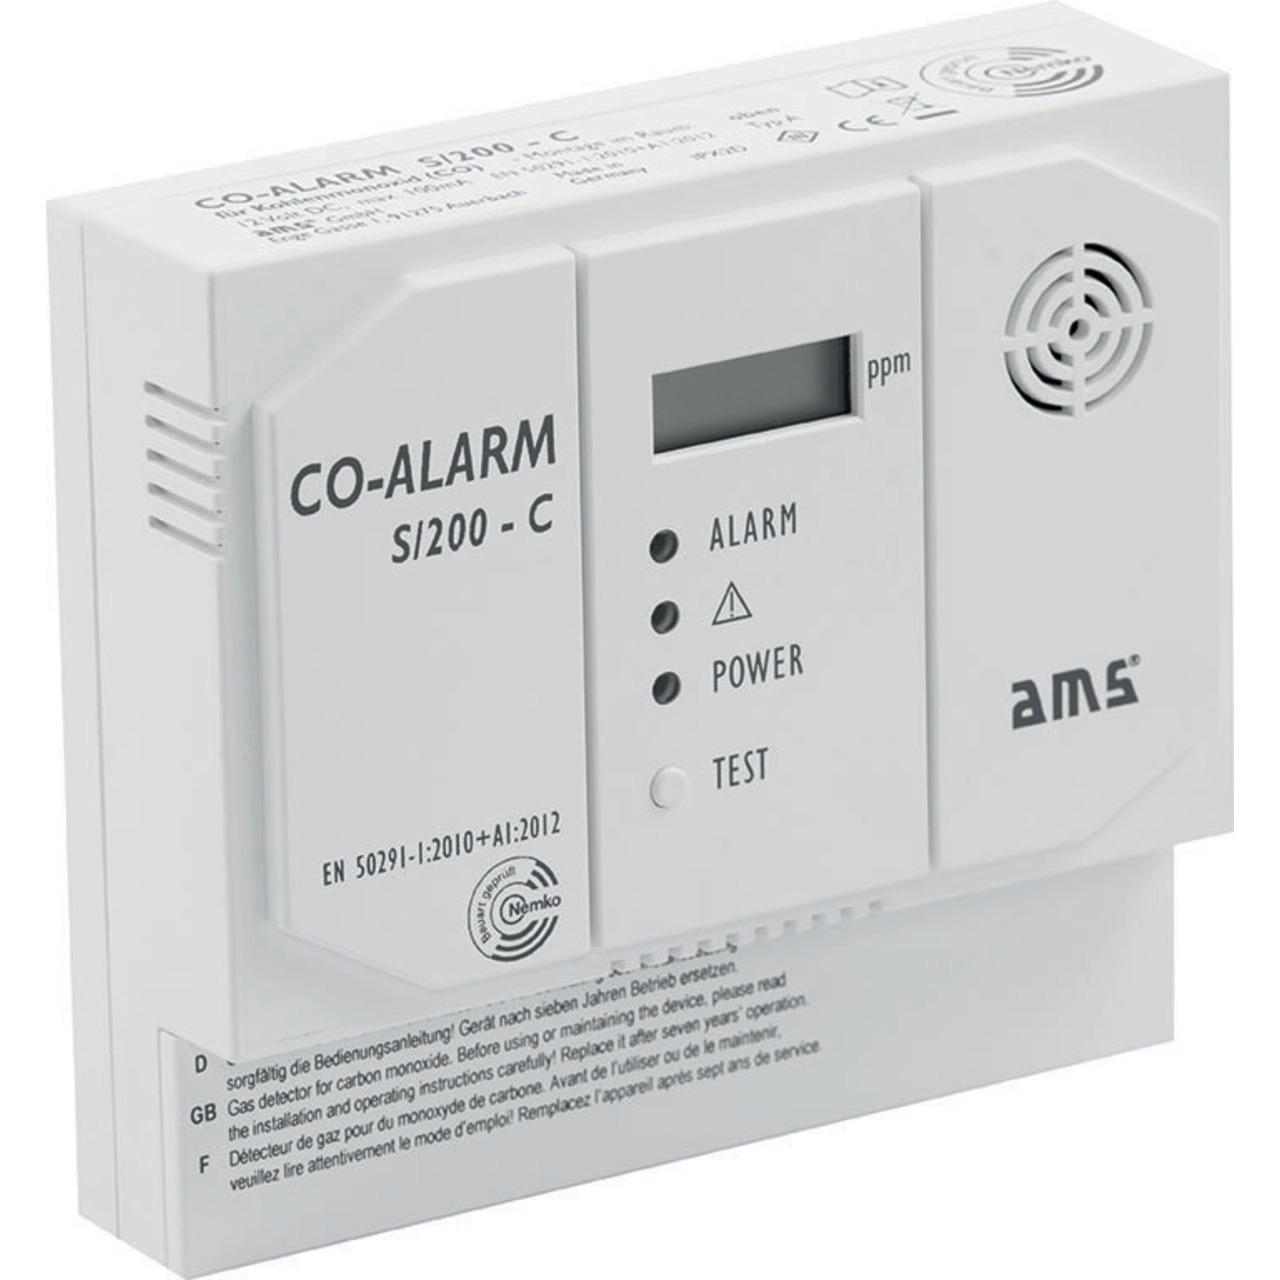 AMS S-200-C Kohlenmonoxidmelder mit Schaltkontakt